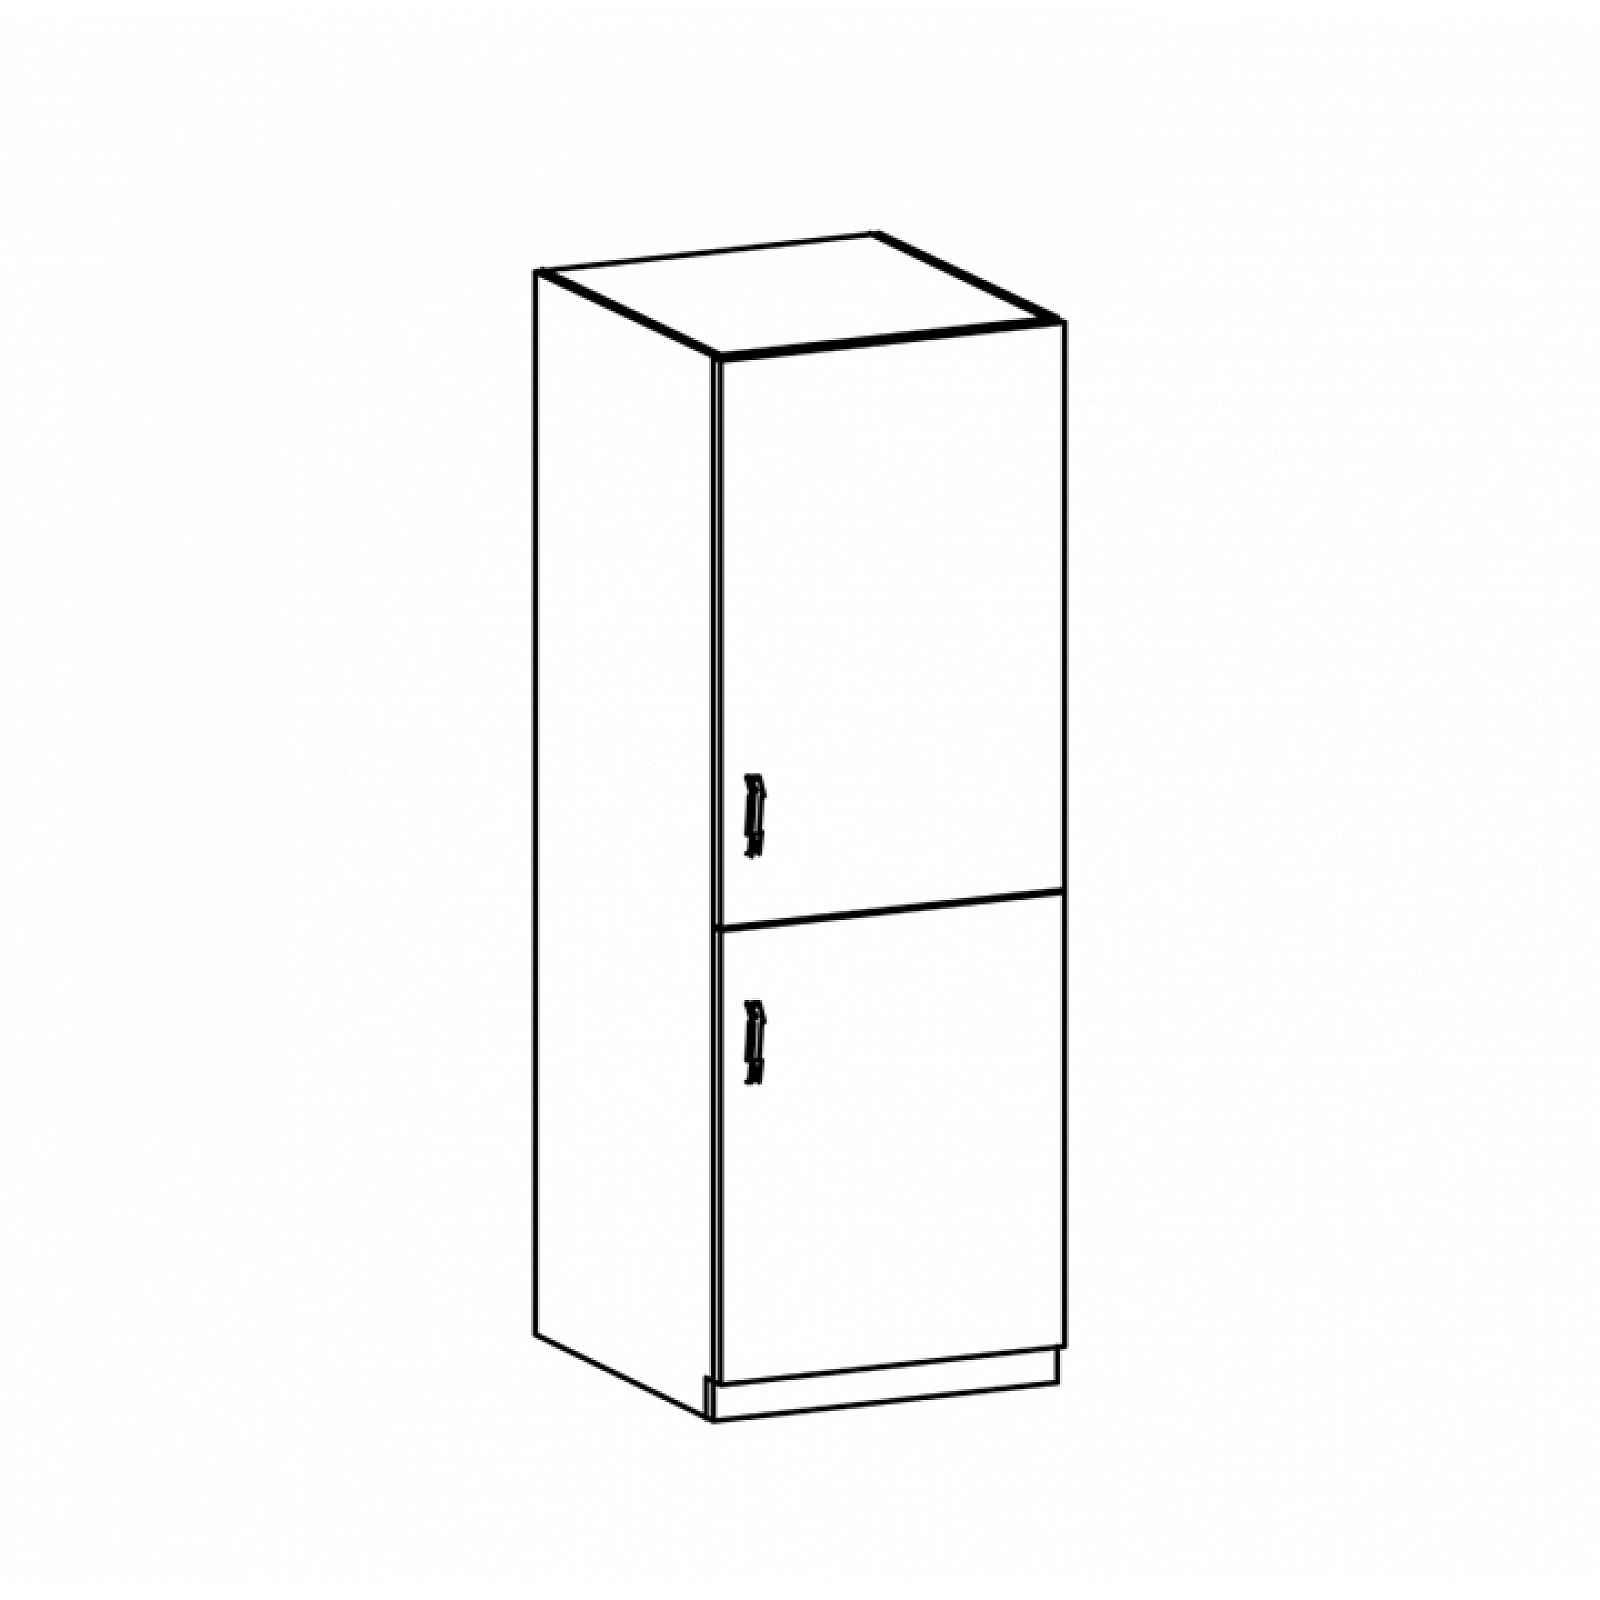 Vysoká skříňka PROVANCE D60R bílá / sosna andersen Tempo Kondela Pravé